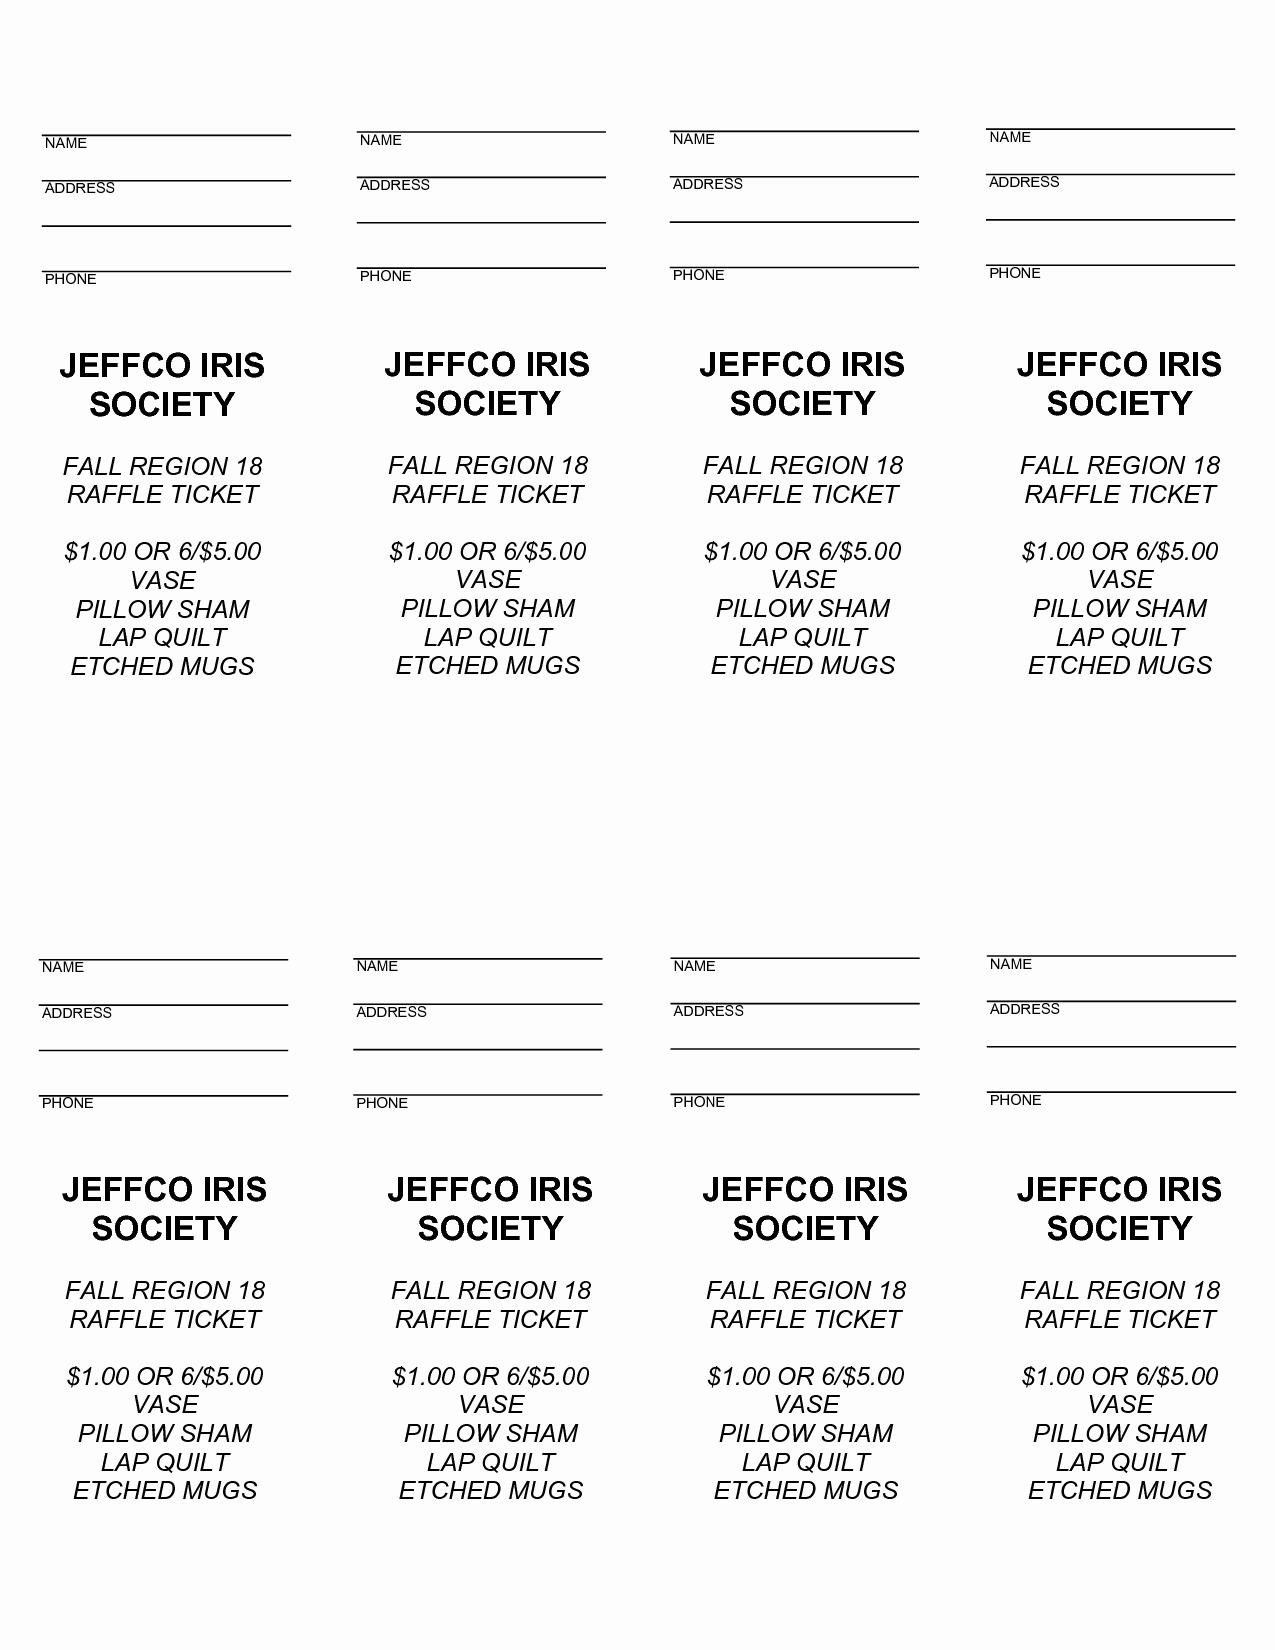 Raffle Ticket Samples Templates Free New 4 Best Of Free Printable Raffle Ticket Templates